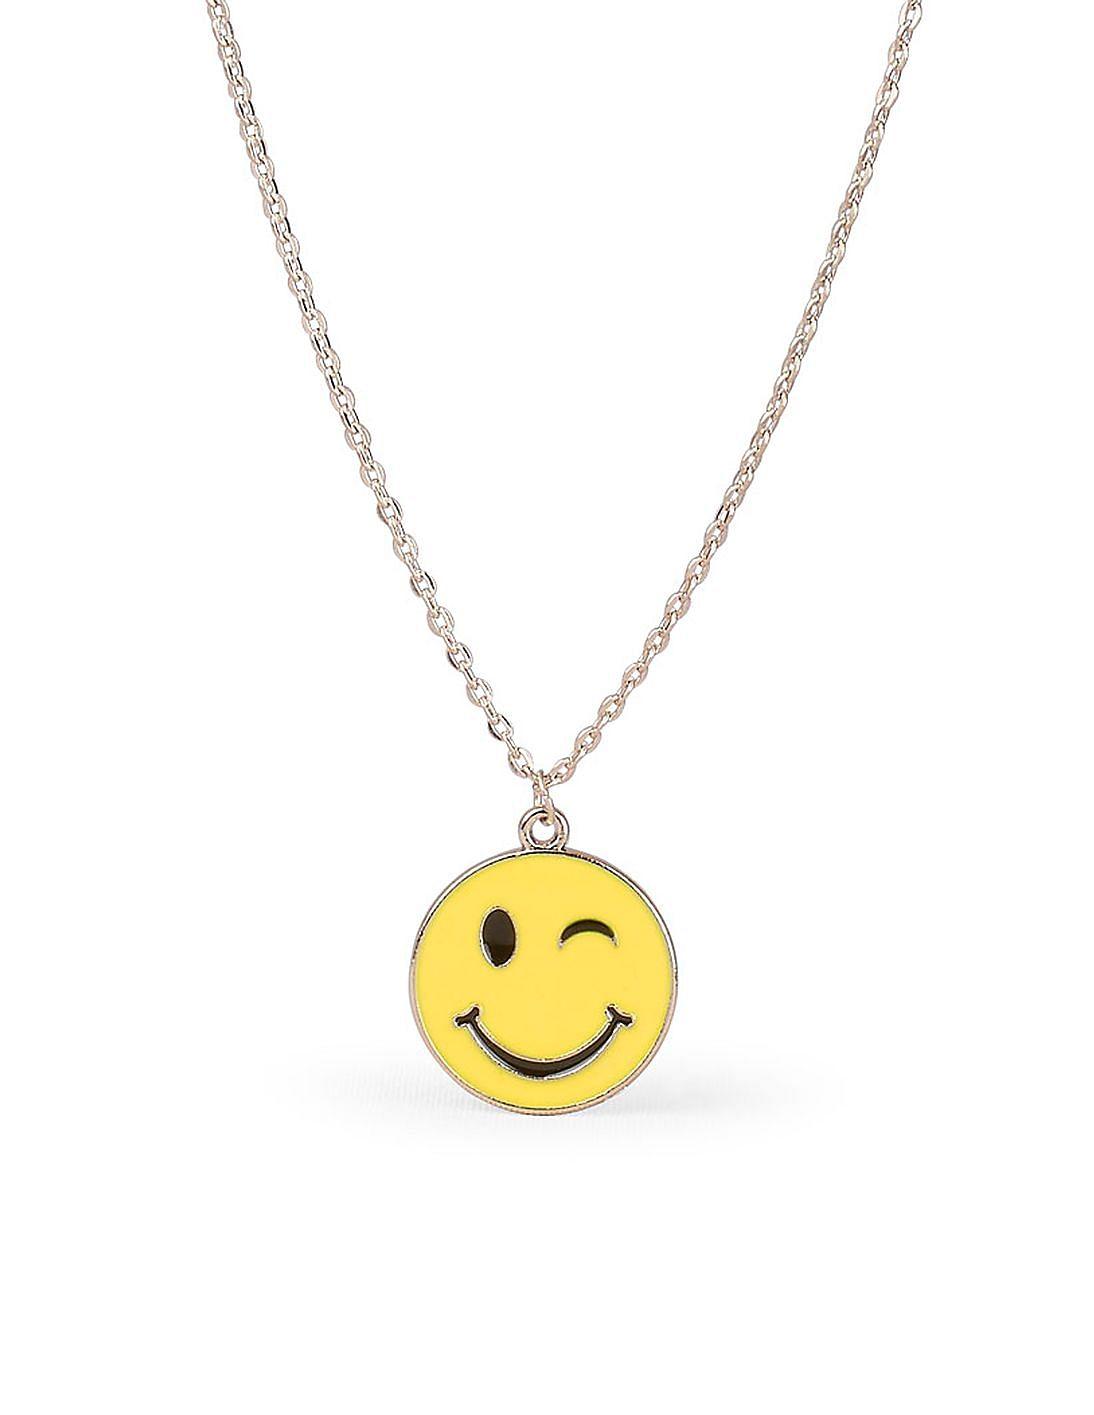 Buy Girls Girls Winking Emoji Face Necklace online at NNNOW com